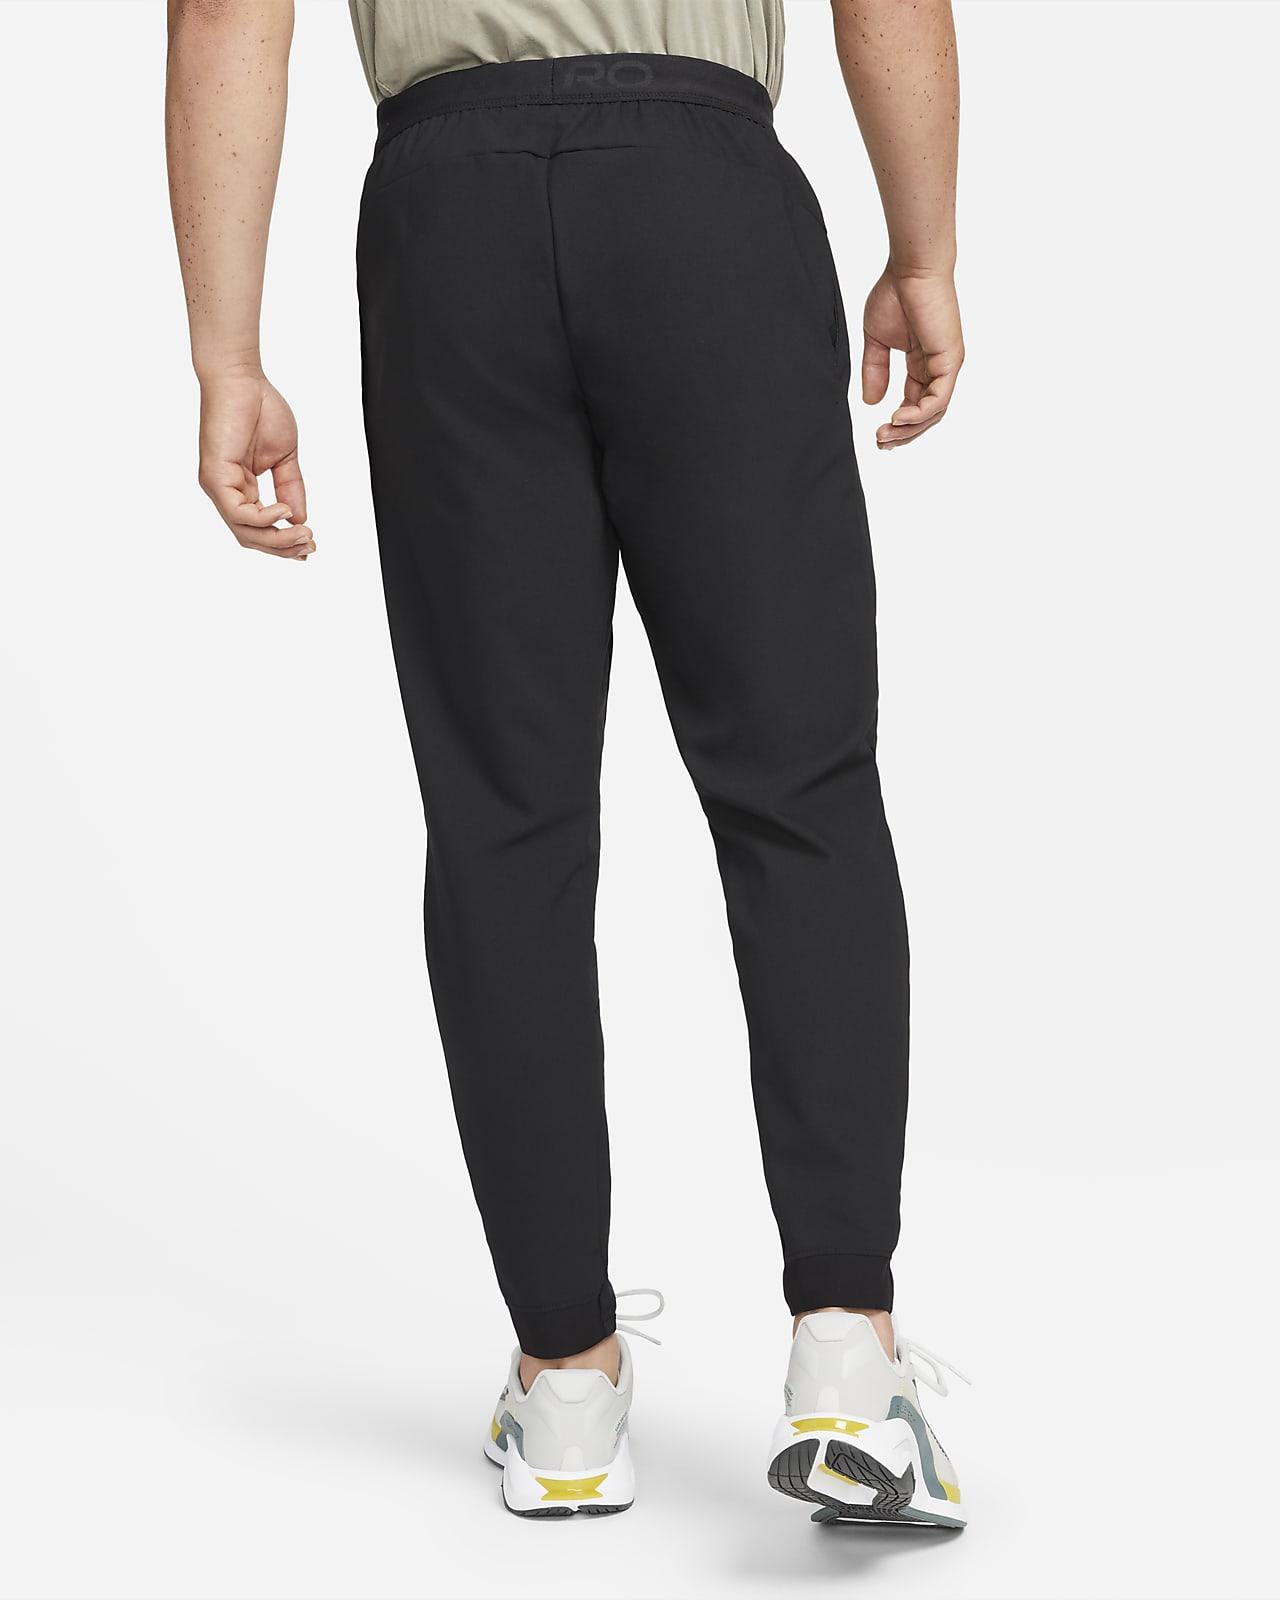 nike s tall pants